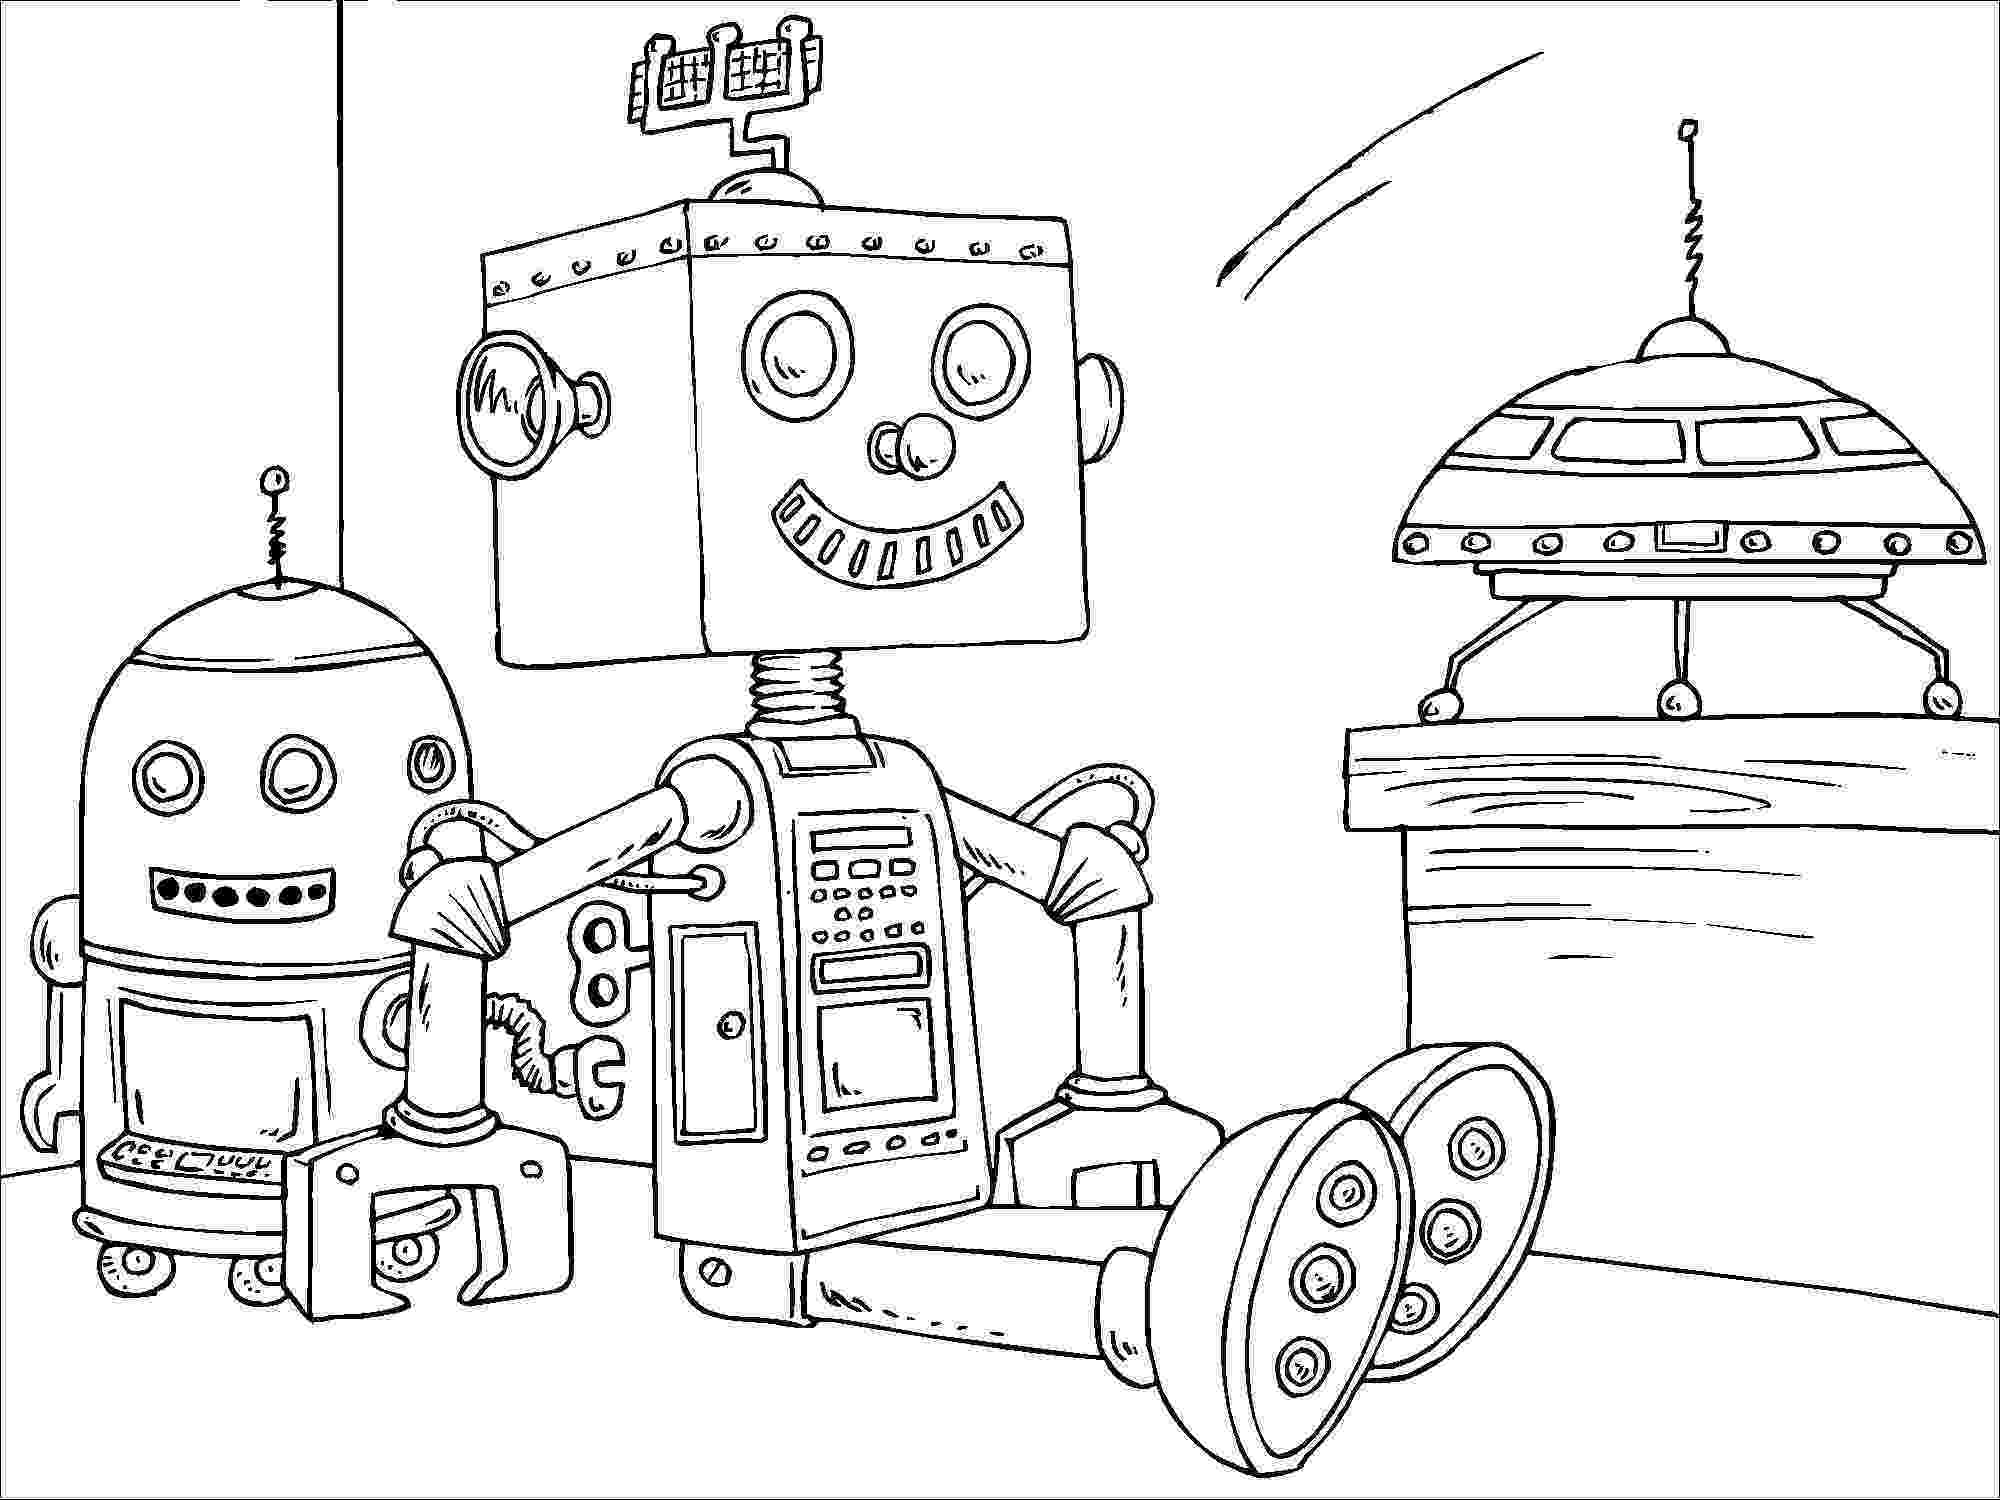 robot coloring pages robot coloring pages 360coloringpages pages coloring robot